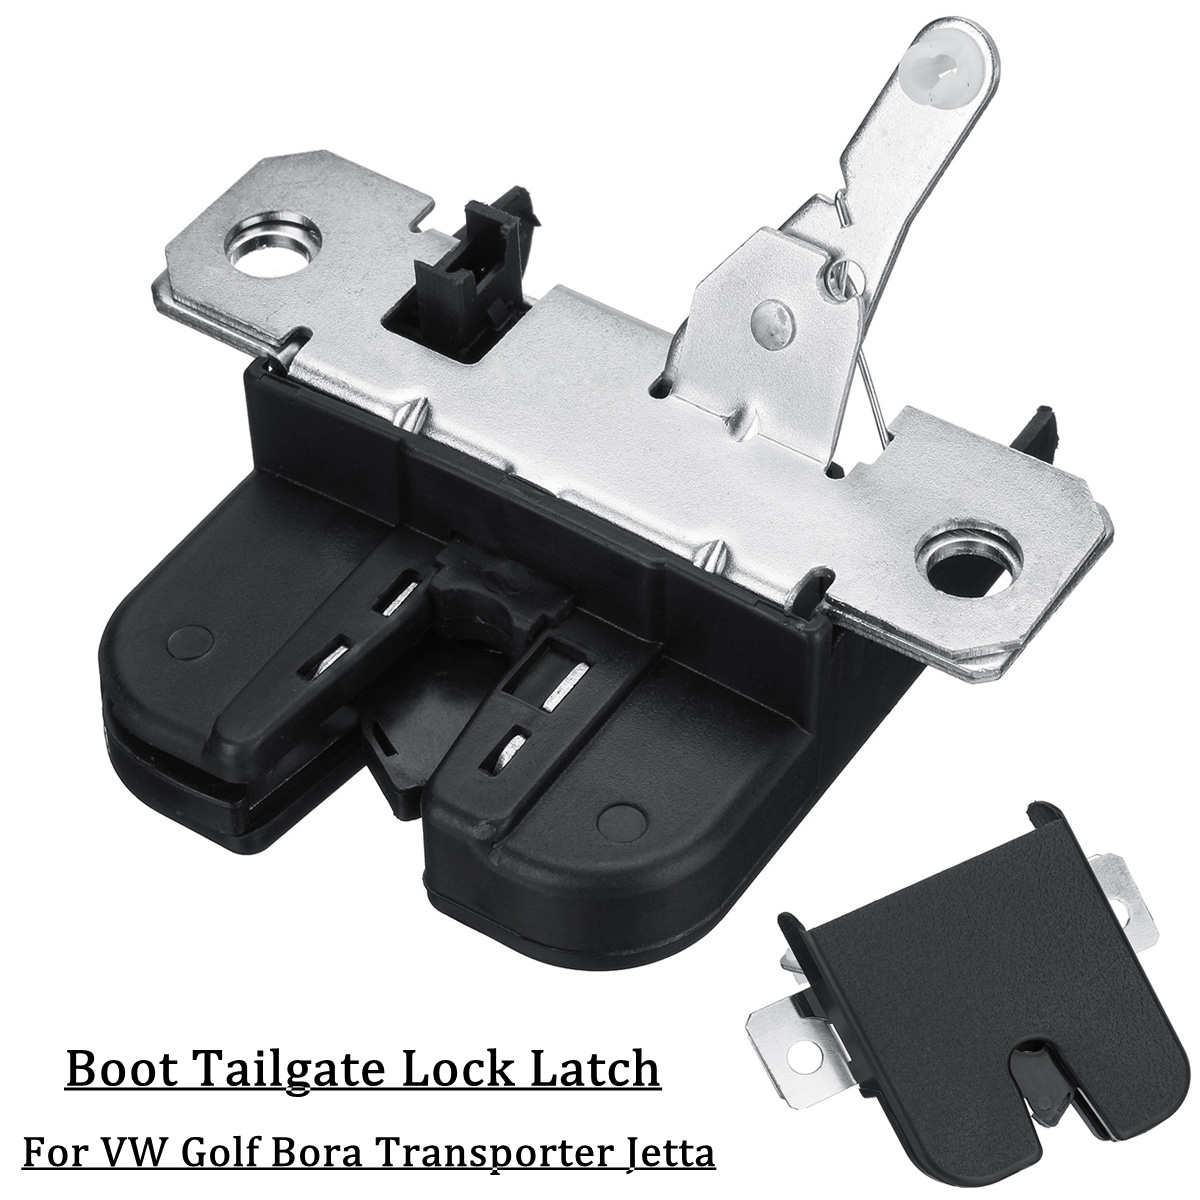 Boot Tailgate Trunk Lock Latch For VW Golf IV Bora Transporter Caddy Jetta Touareg 1J6827505B 1J9827505 6Q6827505E 6L6827505ABoot Tailgate Trunk Lock Latch For VW Golf IV Bora Transporter Caddy Jetta Touareg 1J6827505B 1J9827505 6Q6827505E 6L6827505A